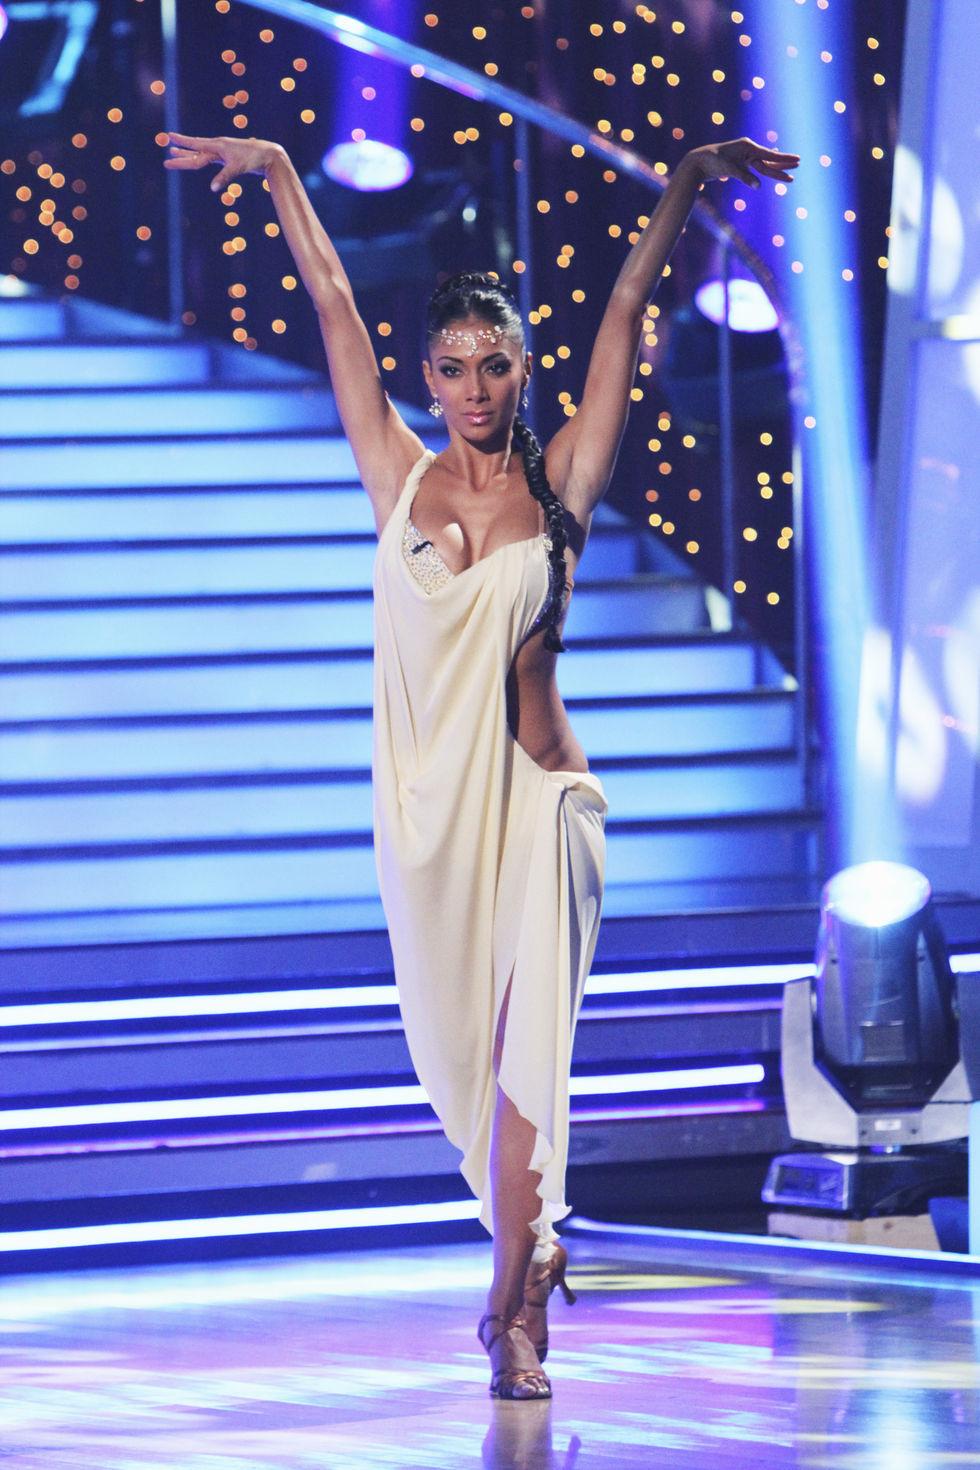 Nicole Scherzinger At Dancing With The Stars 06 Gotceleb